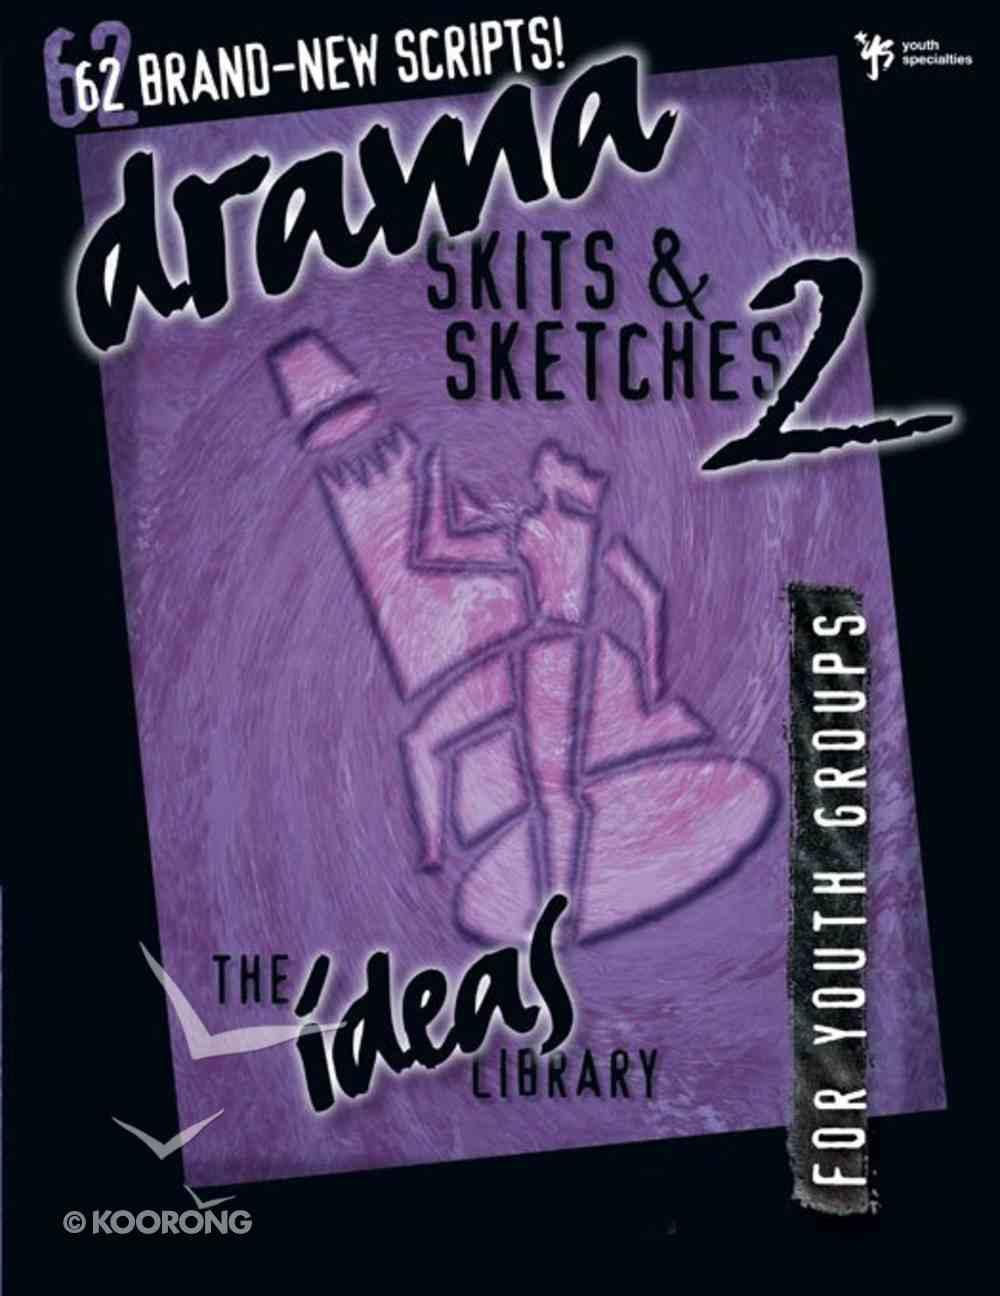 Ideas Library: Drama, Skits & Sketches 2 eBook